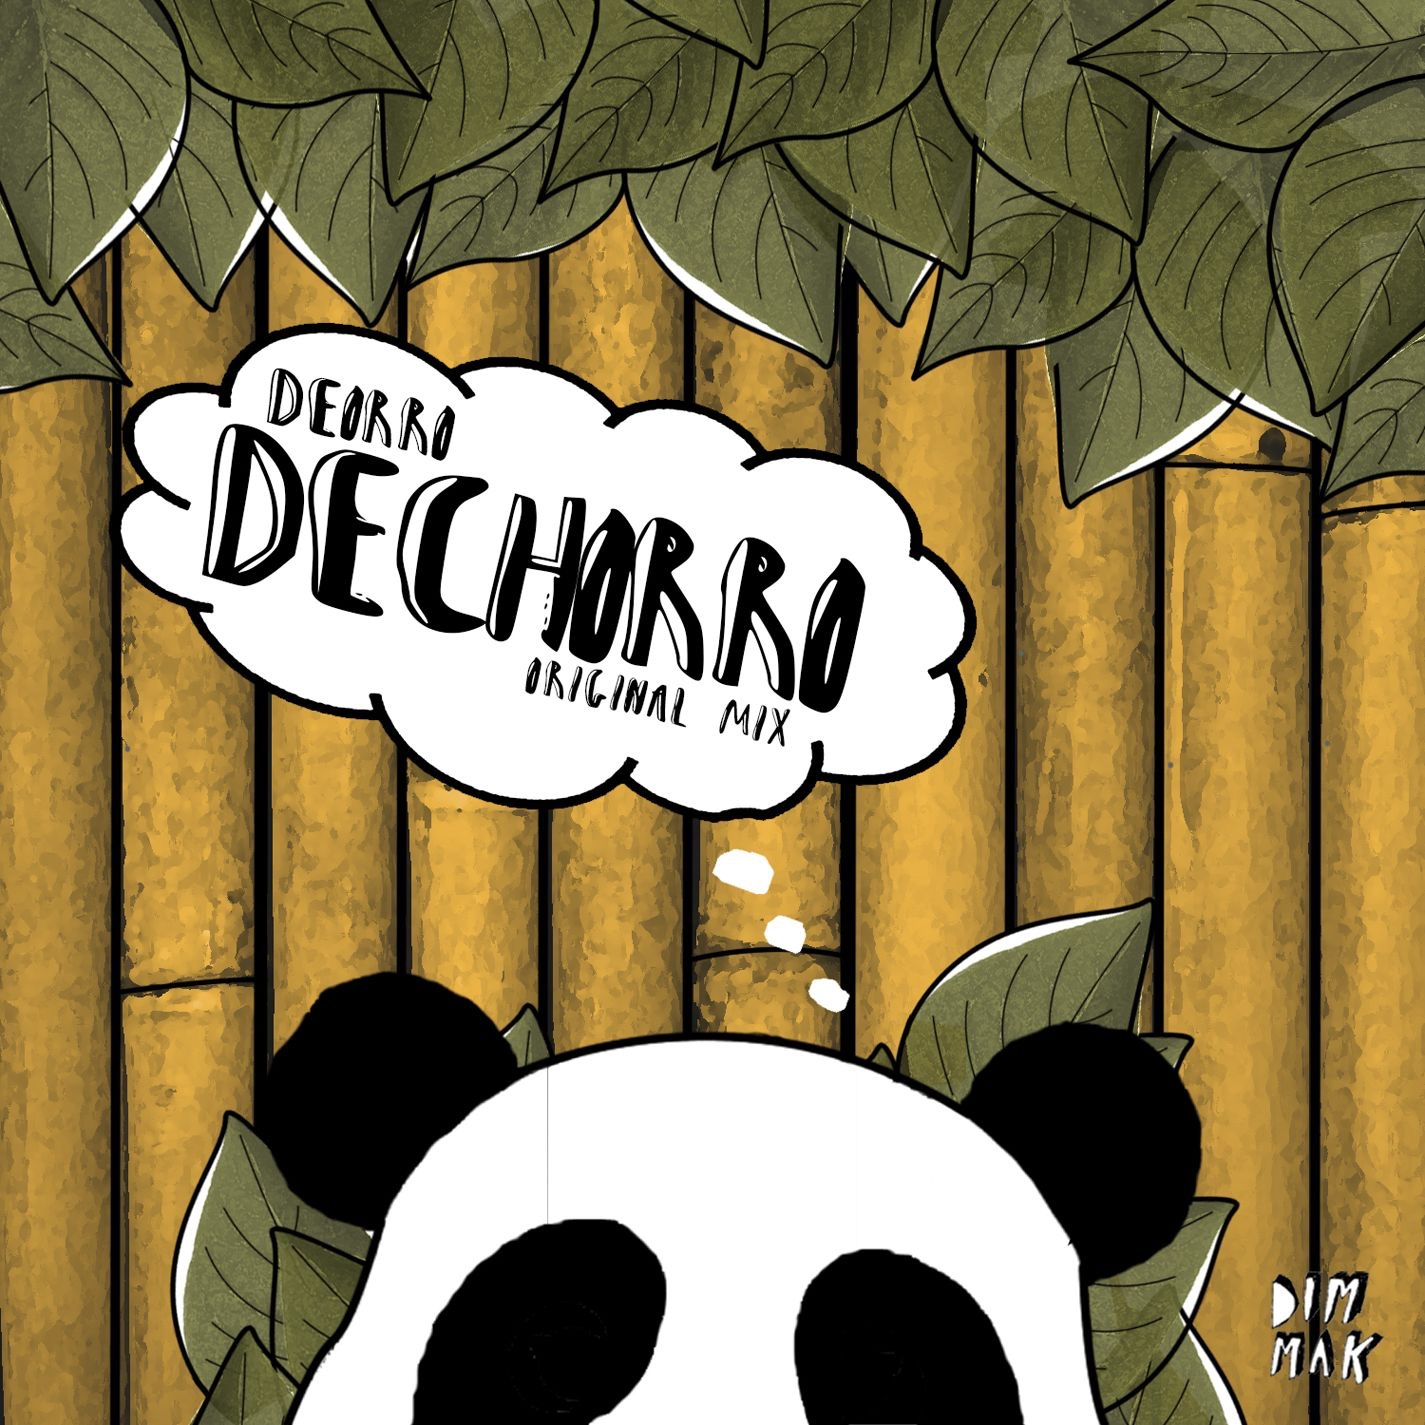 Dechorro - Single